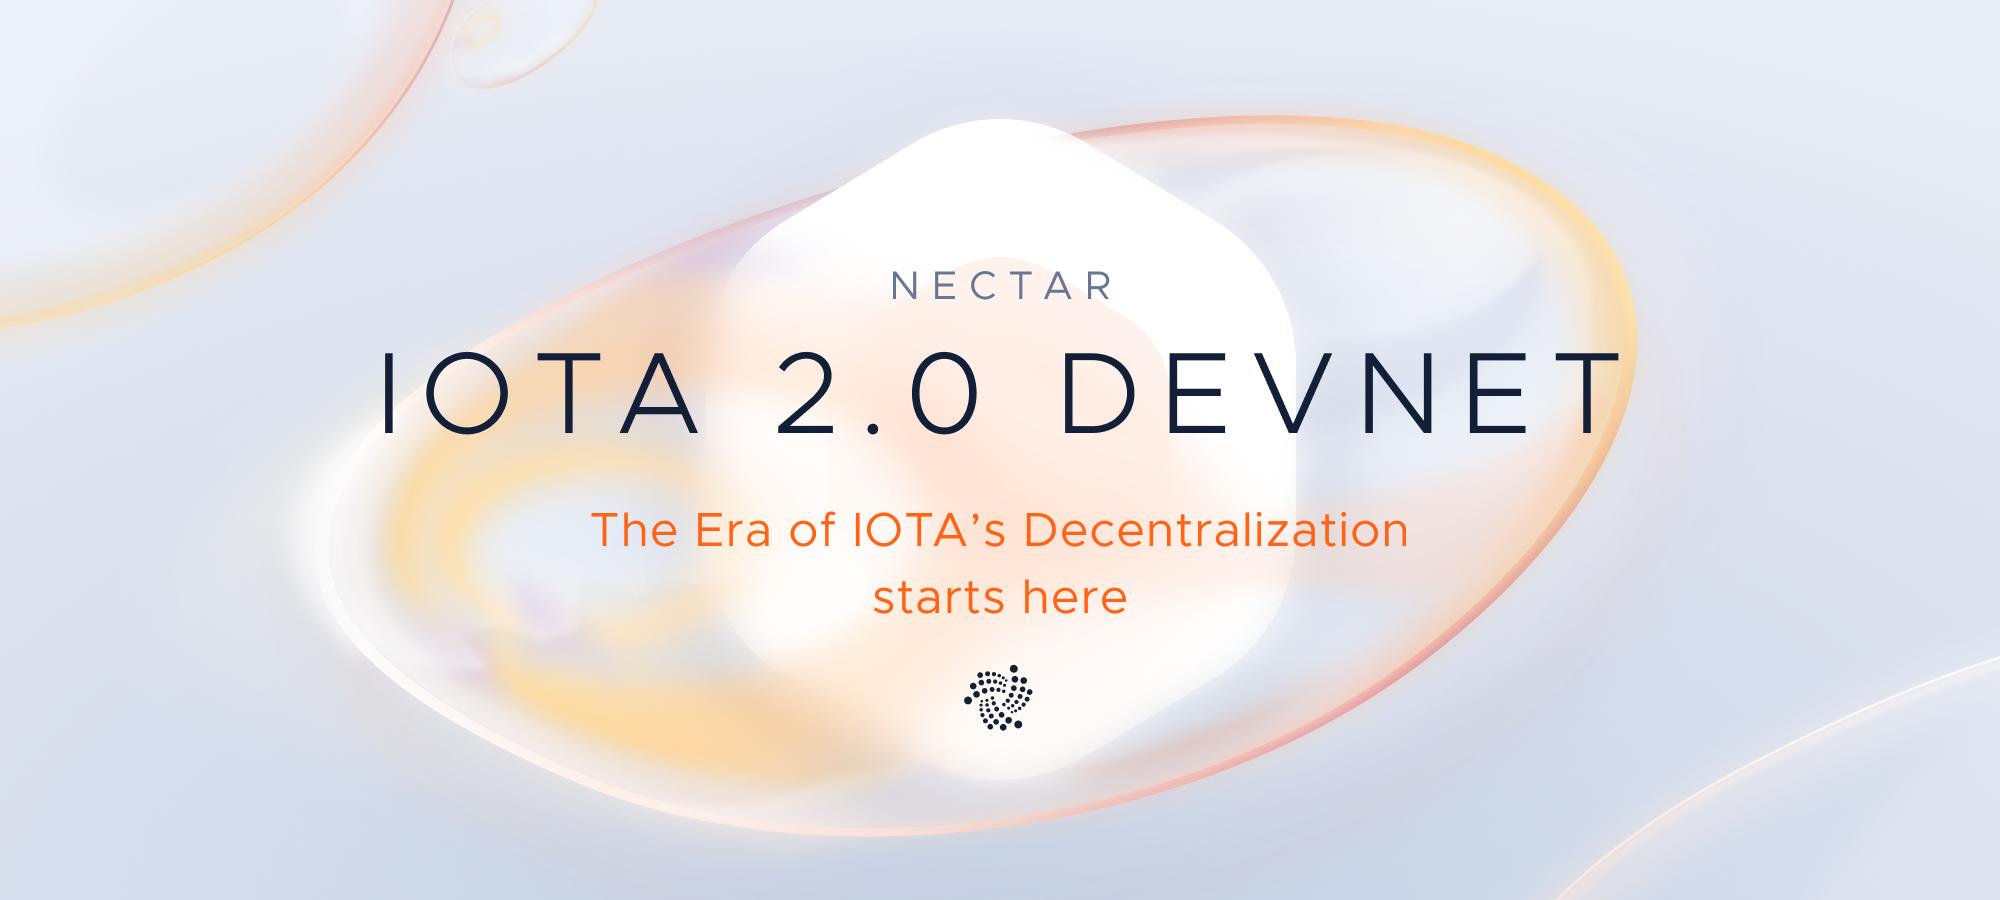 IOTA 2.0 DevNet (Nectar) - The Era of IOTA's Decentralization Starts Here